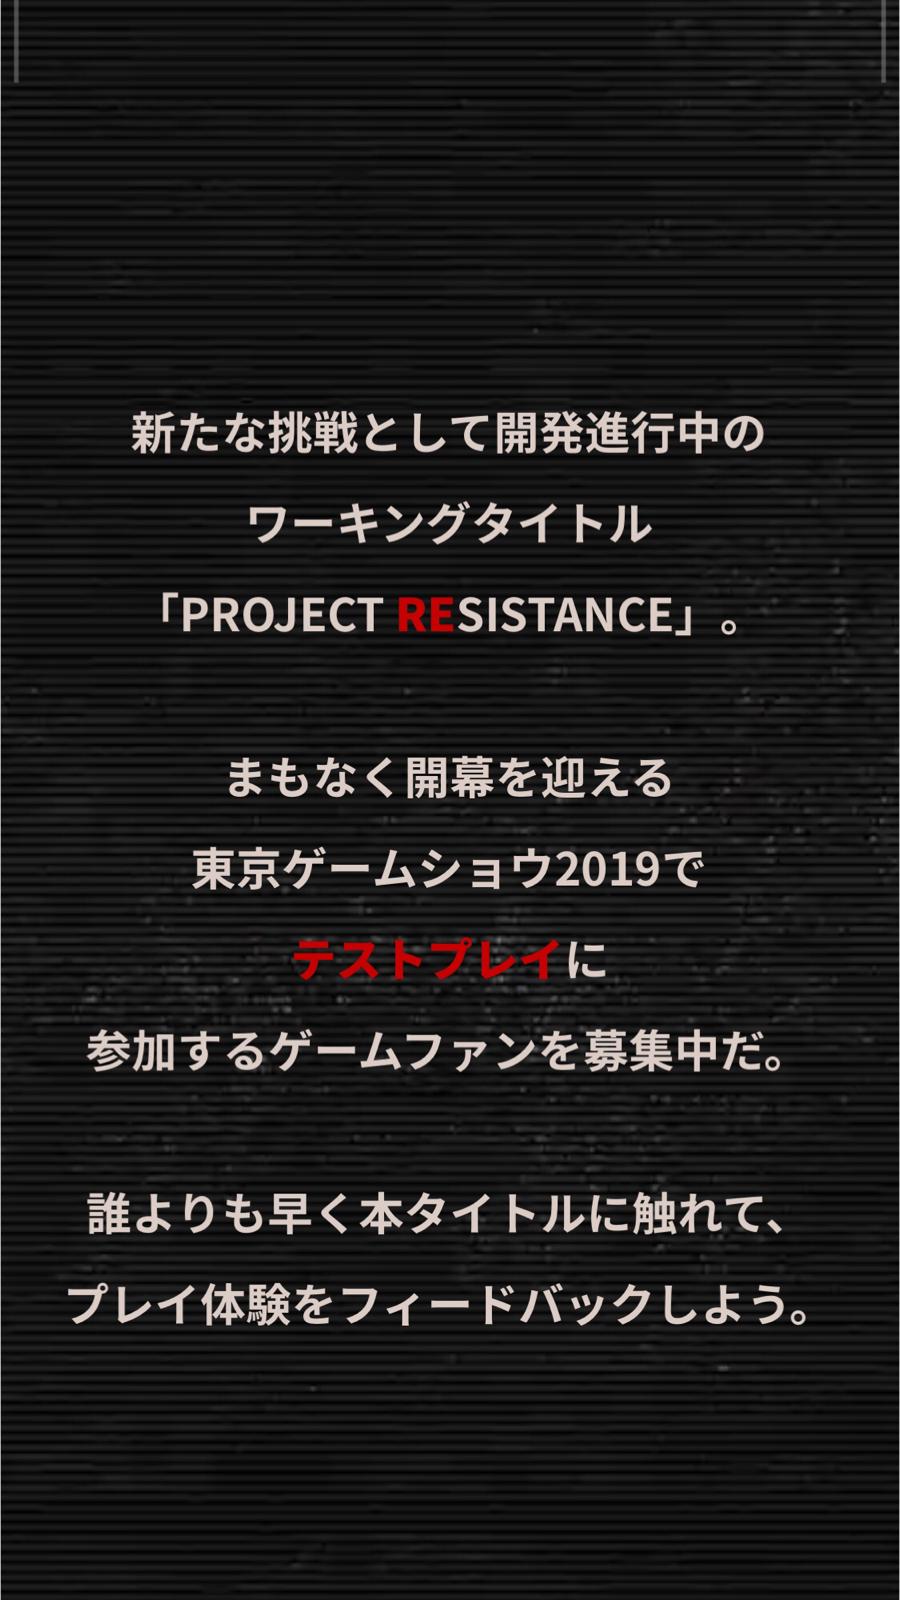 8Cf8jFQ - バイオハザード新作「PROJECT RESISTANCE」始動! 9月10日PV公開!